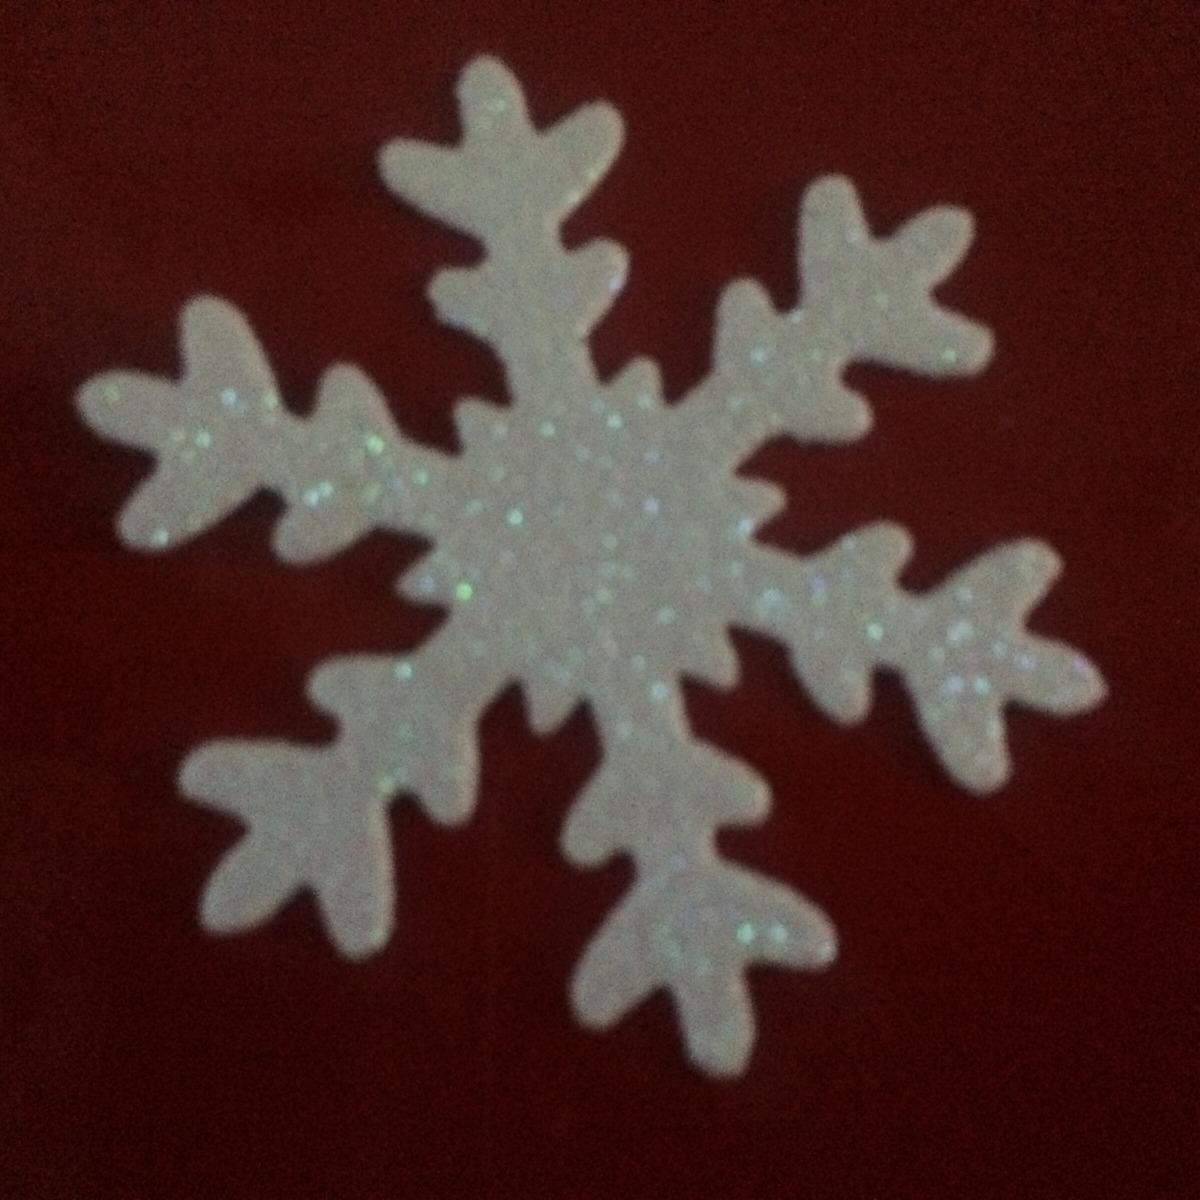 Copos De Nieve Goma Eva Glitter Adhesivos 19000 En Mercado Libre